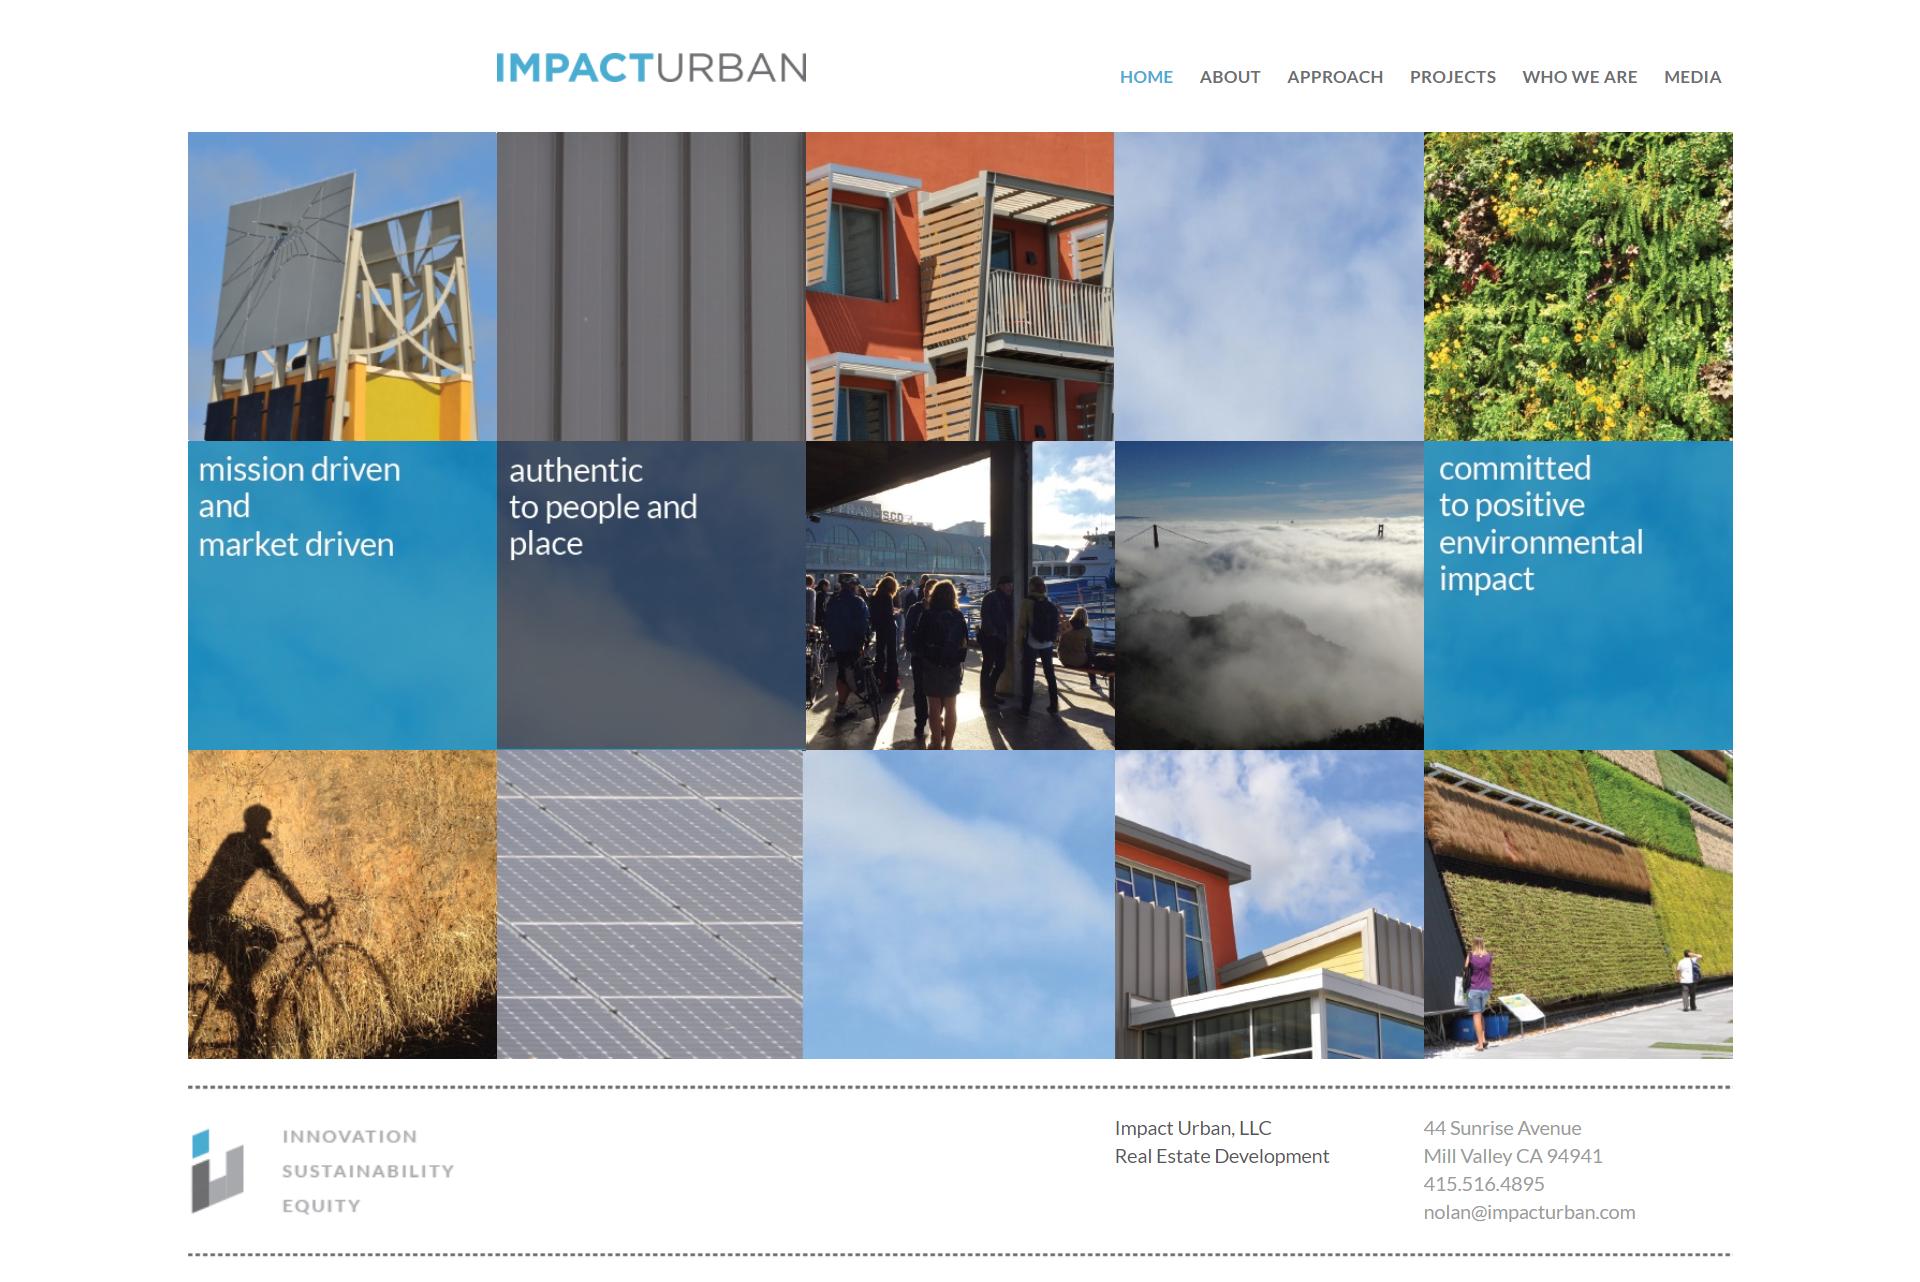 Impact Urban